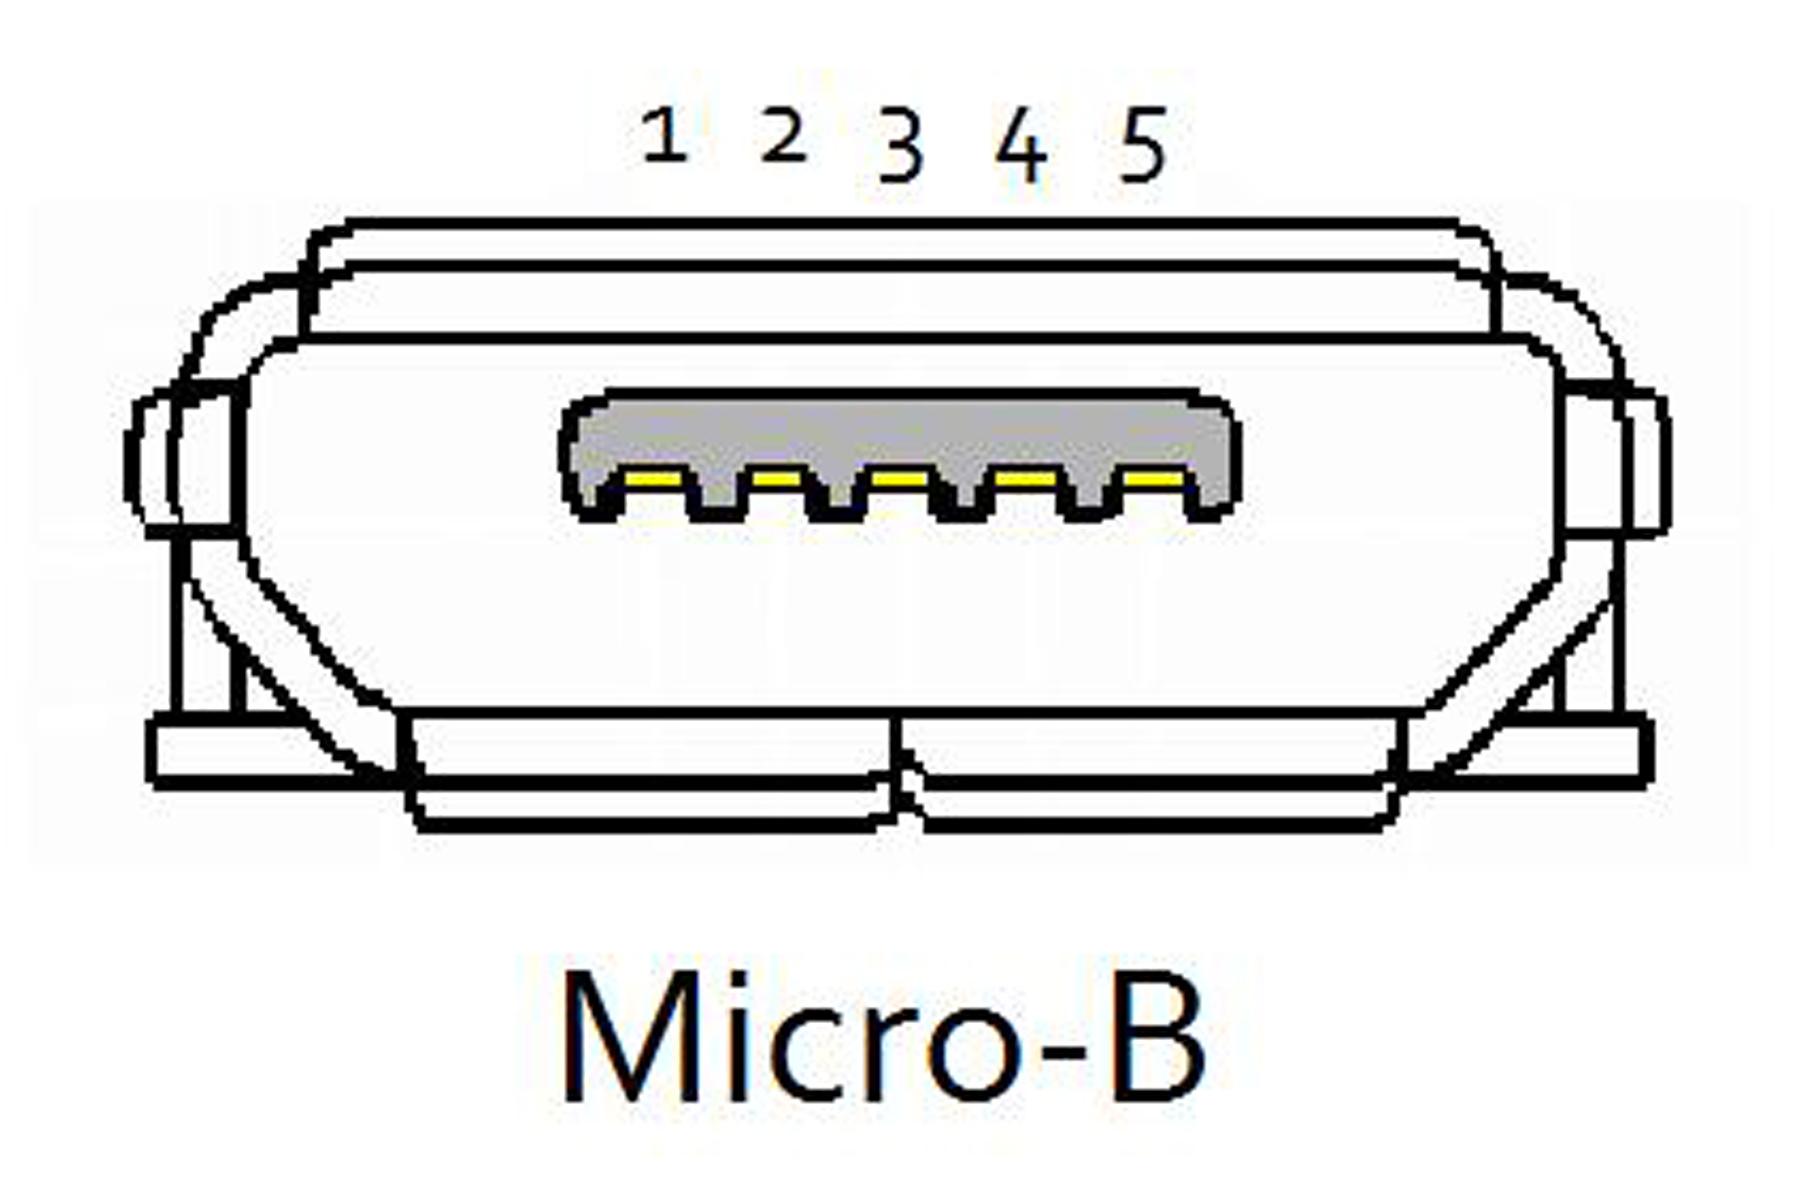 hight resolution of file usb micro b receptacle jpg